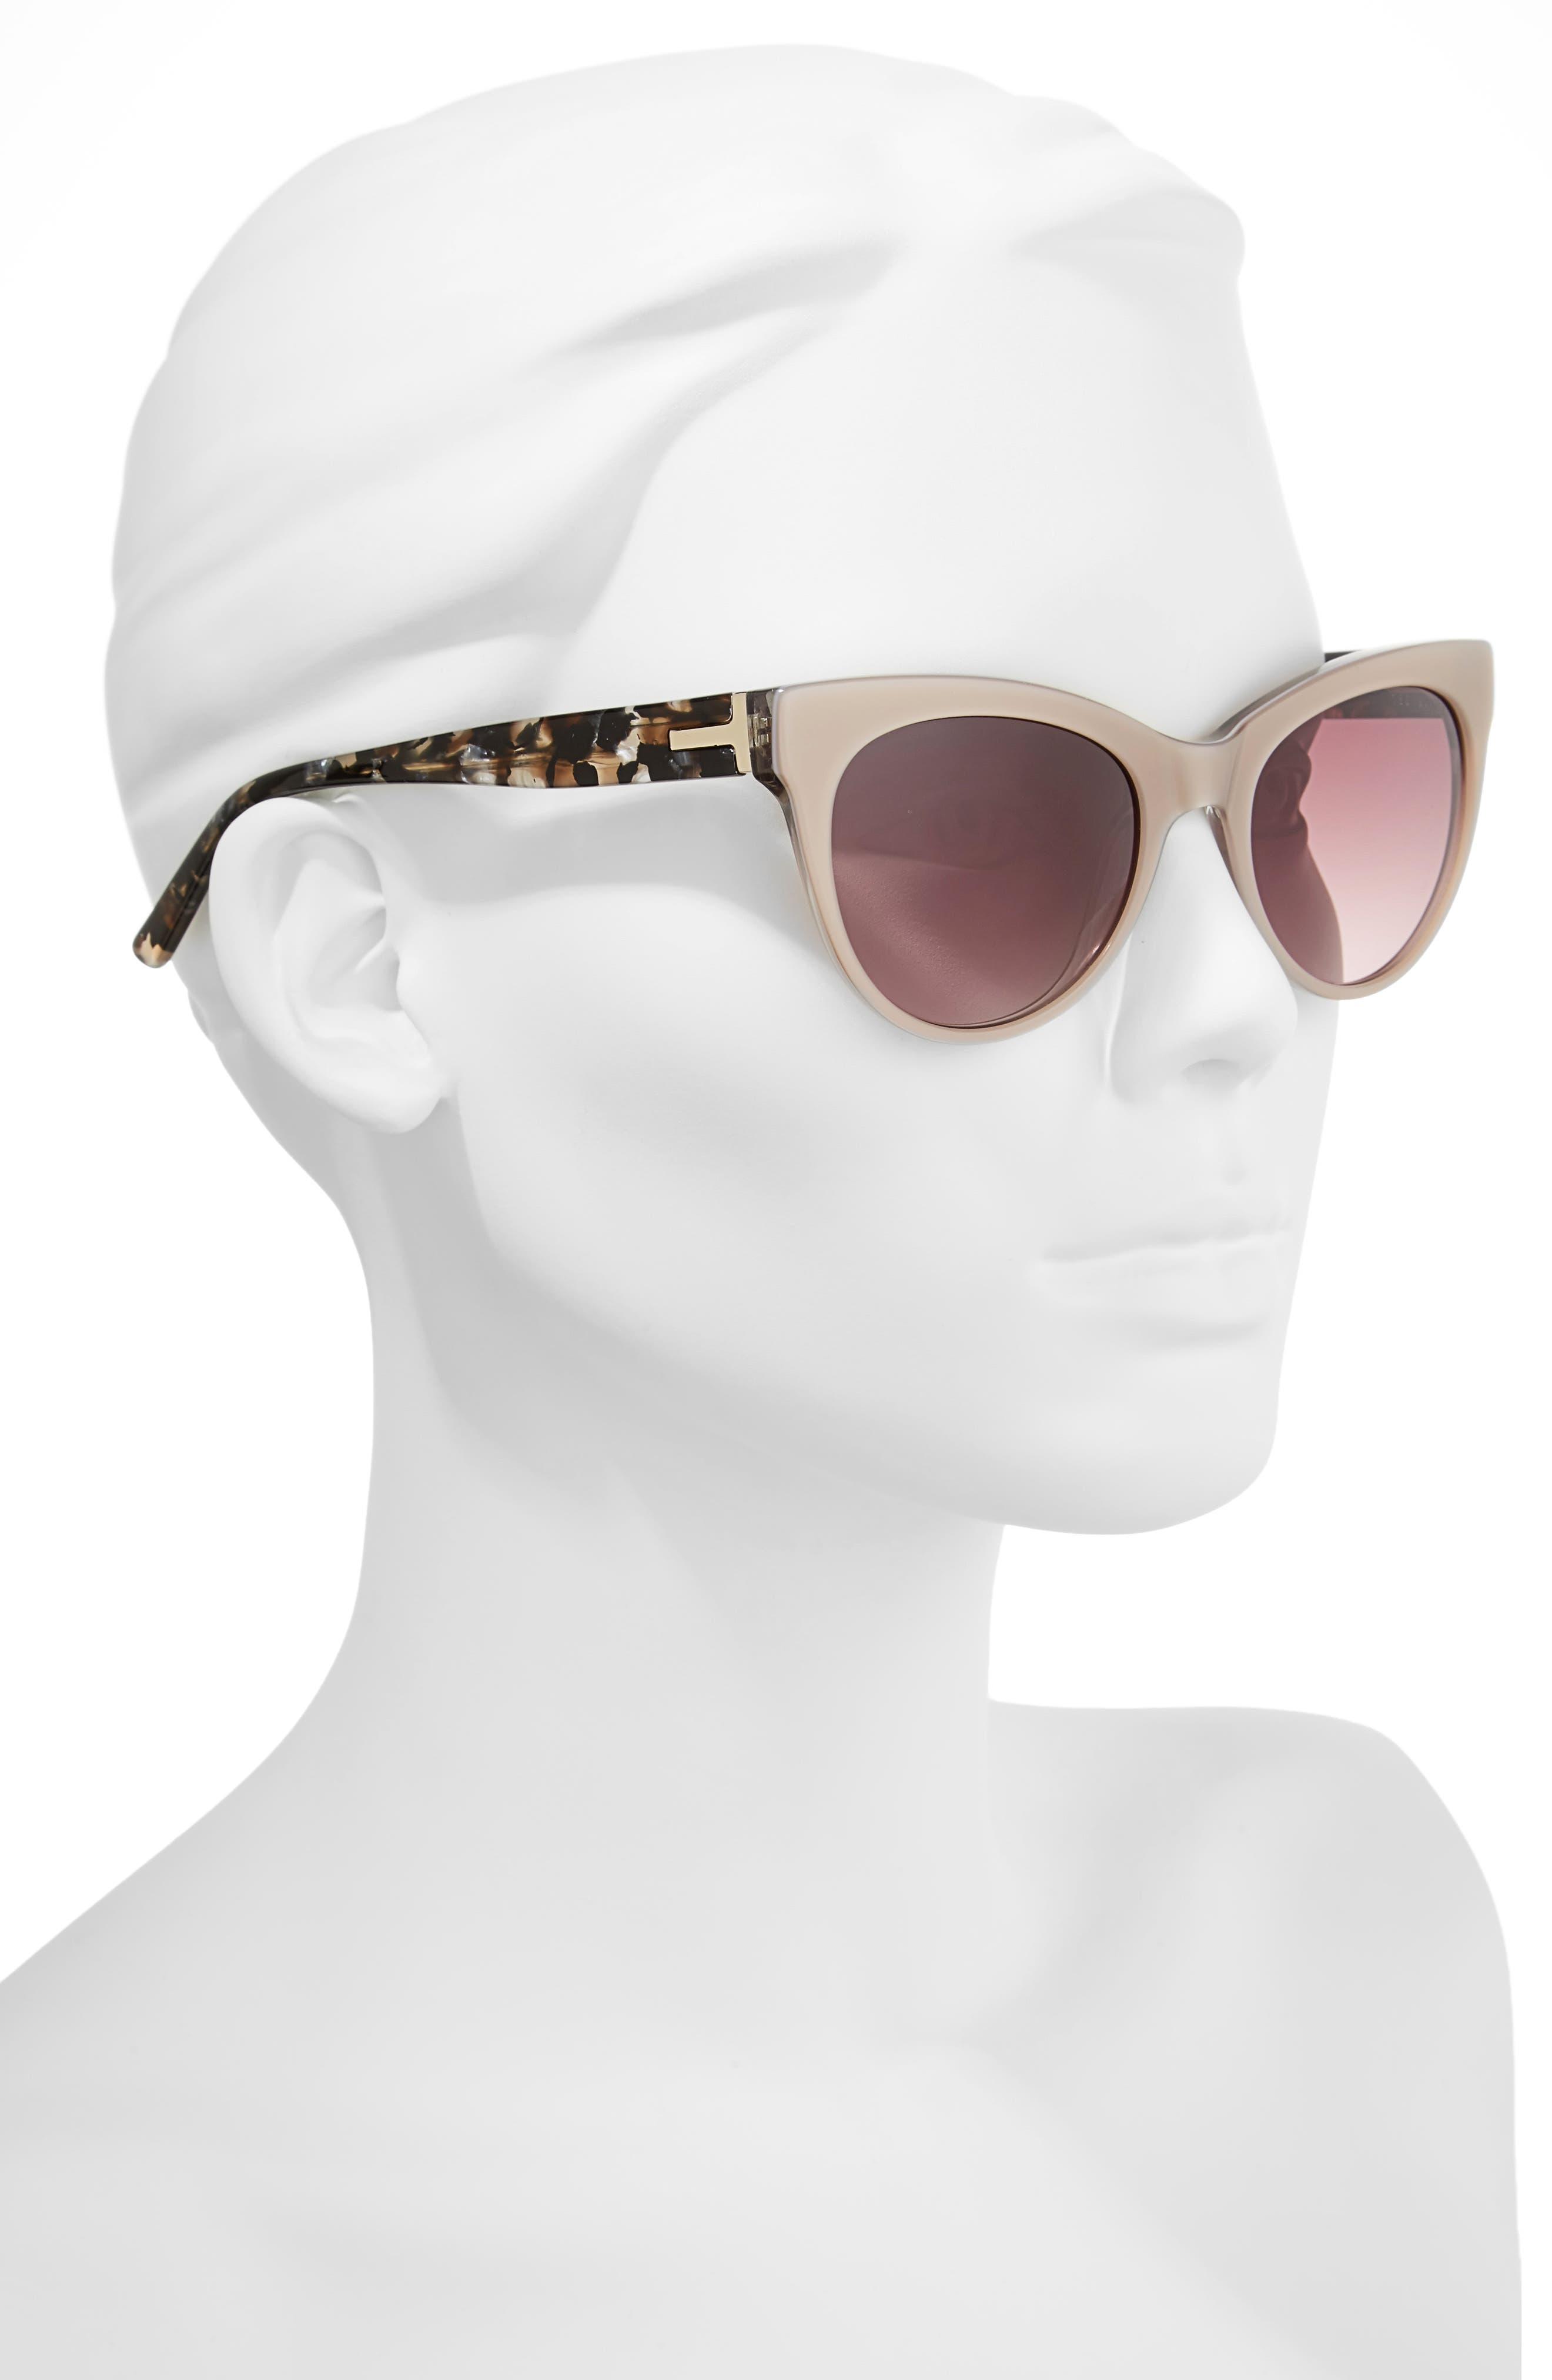 51mm Cat Eye Sunglasses,                             Alternate thumbnail 2, color,                             200